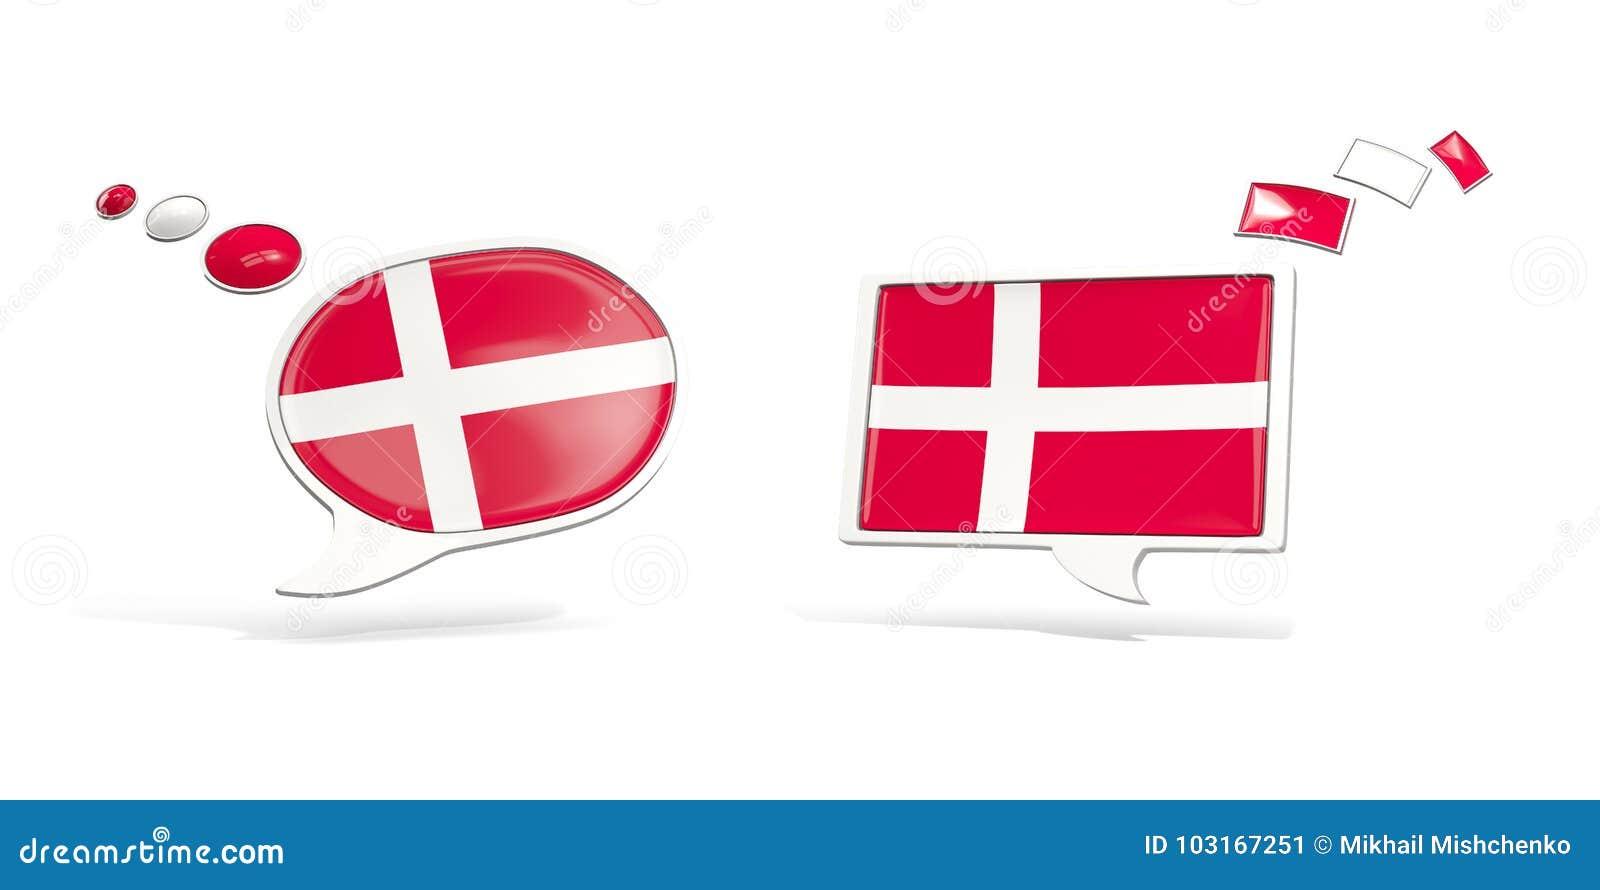 Denmark chat